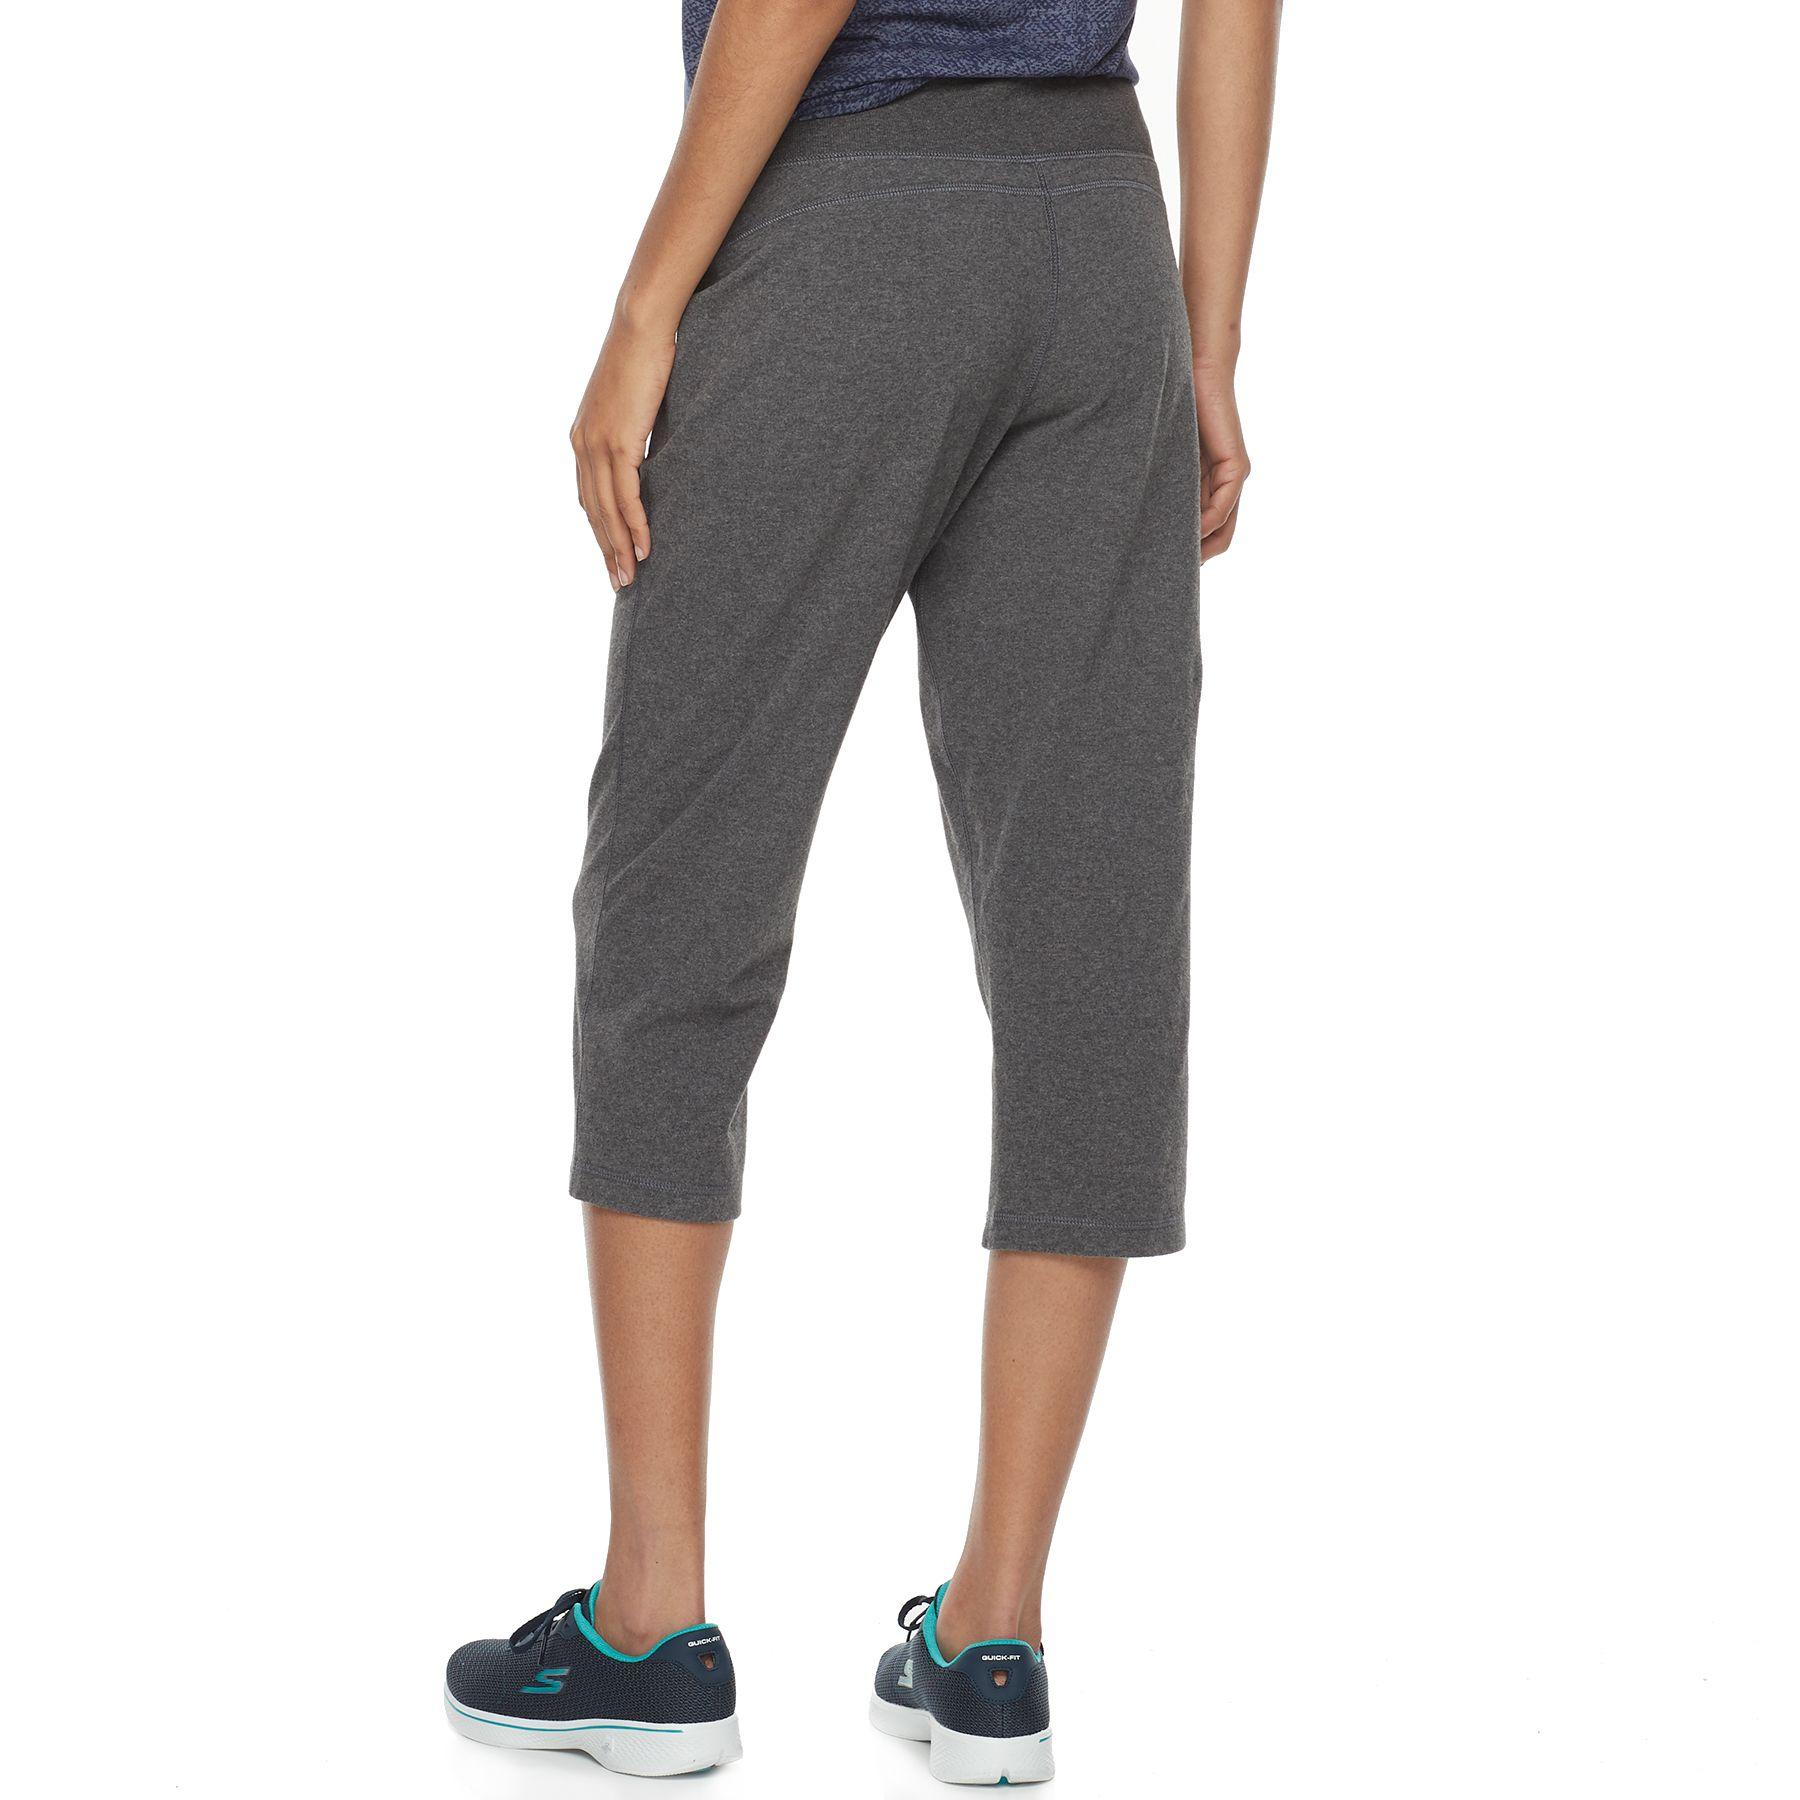 1b0e23dce6eb84 Womens Workout Clothes | Kohl's